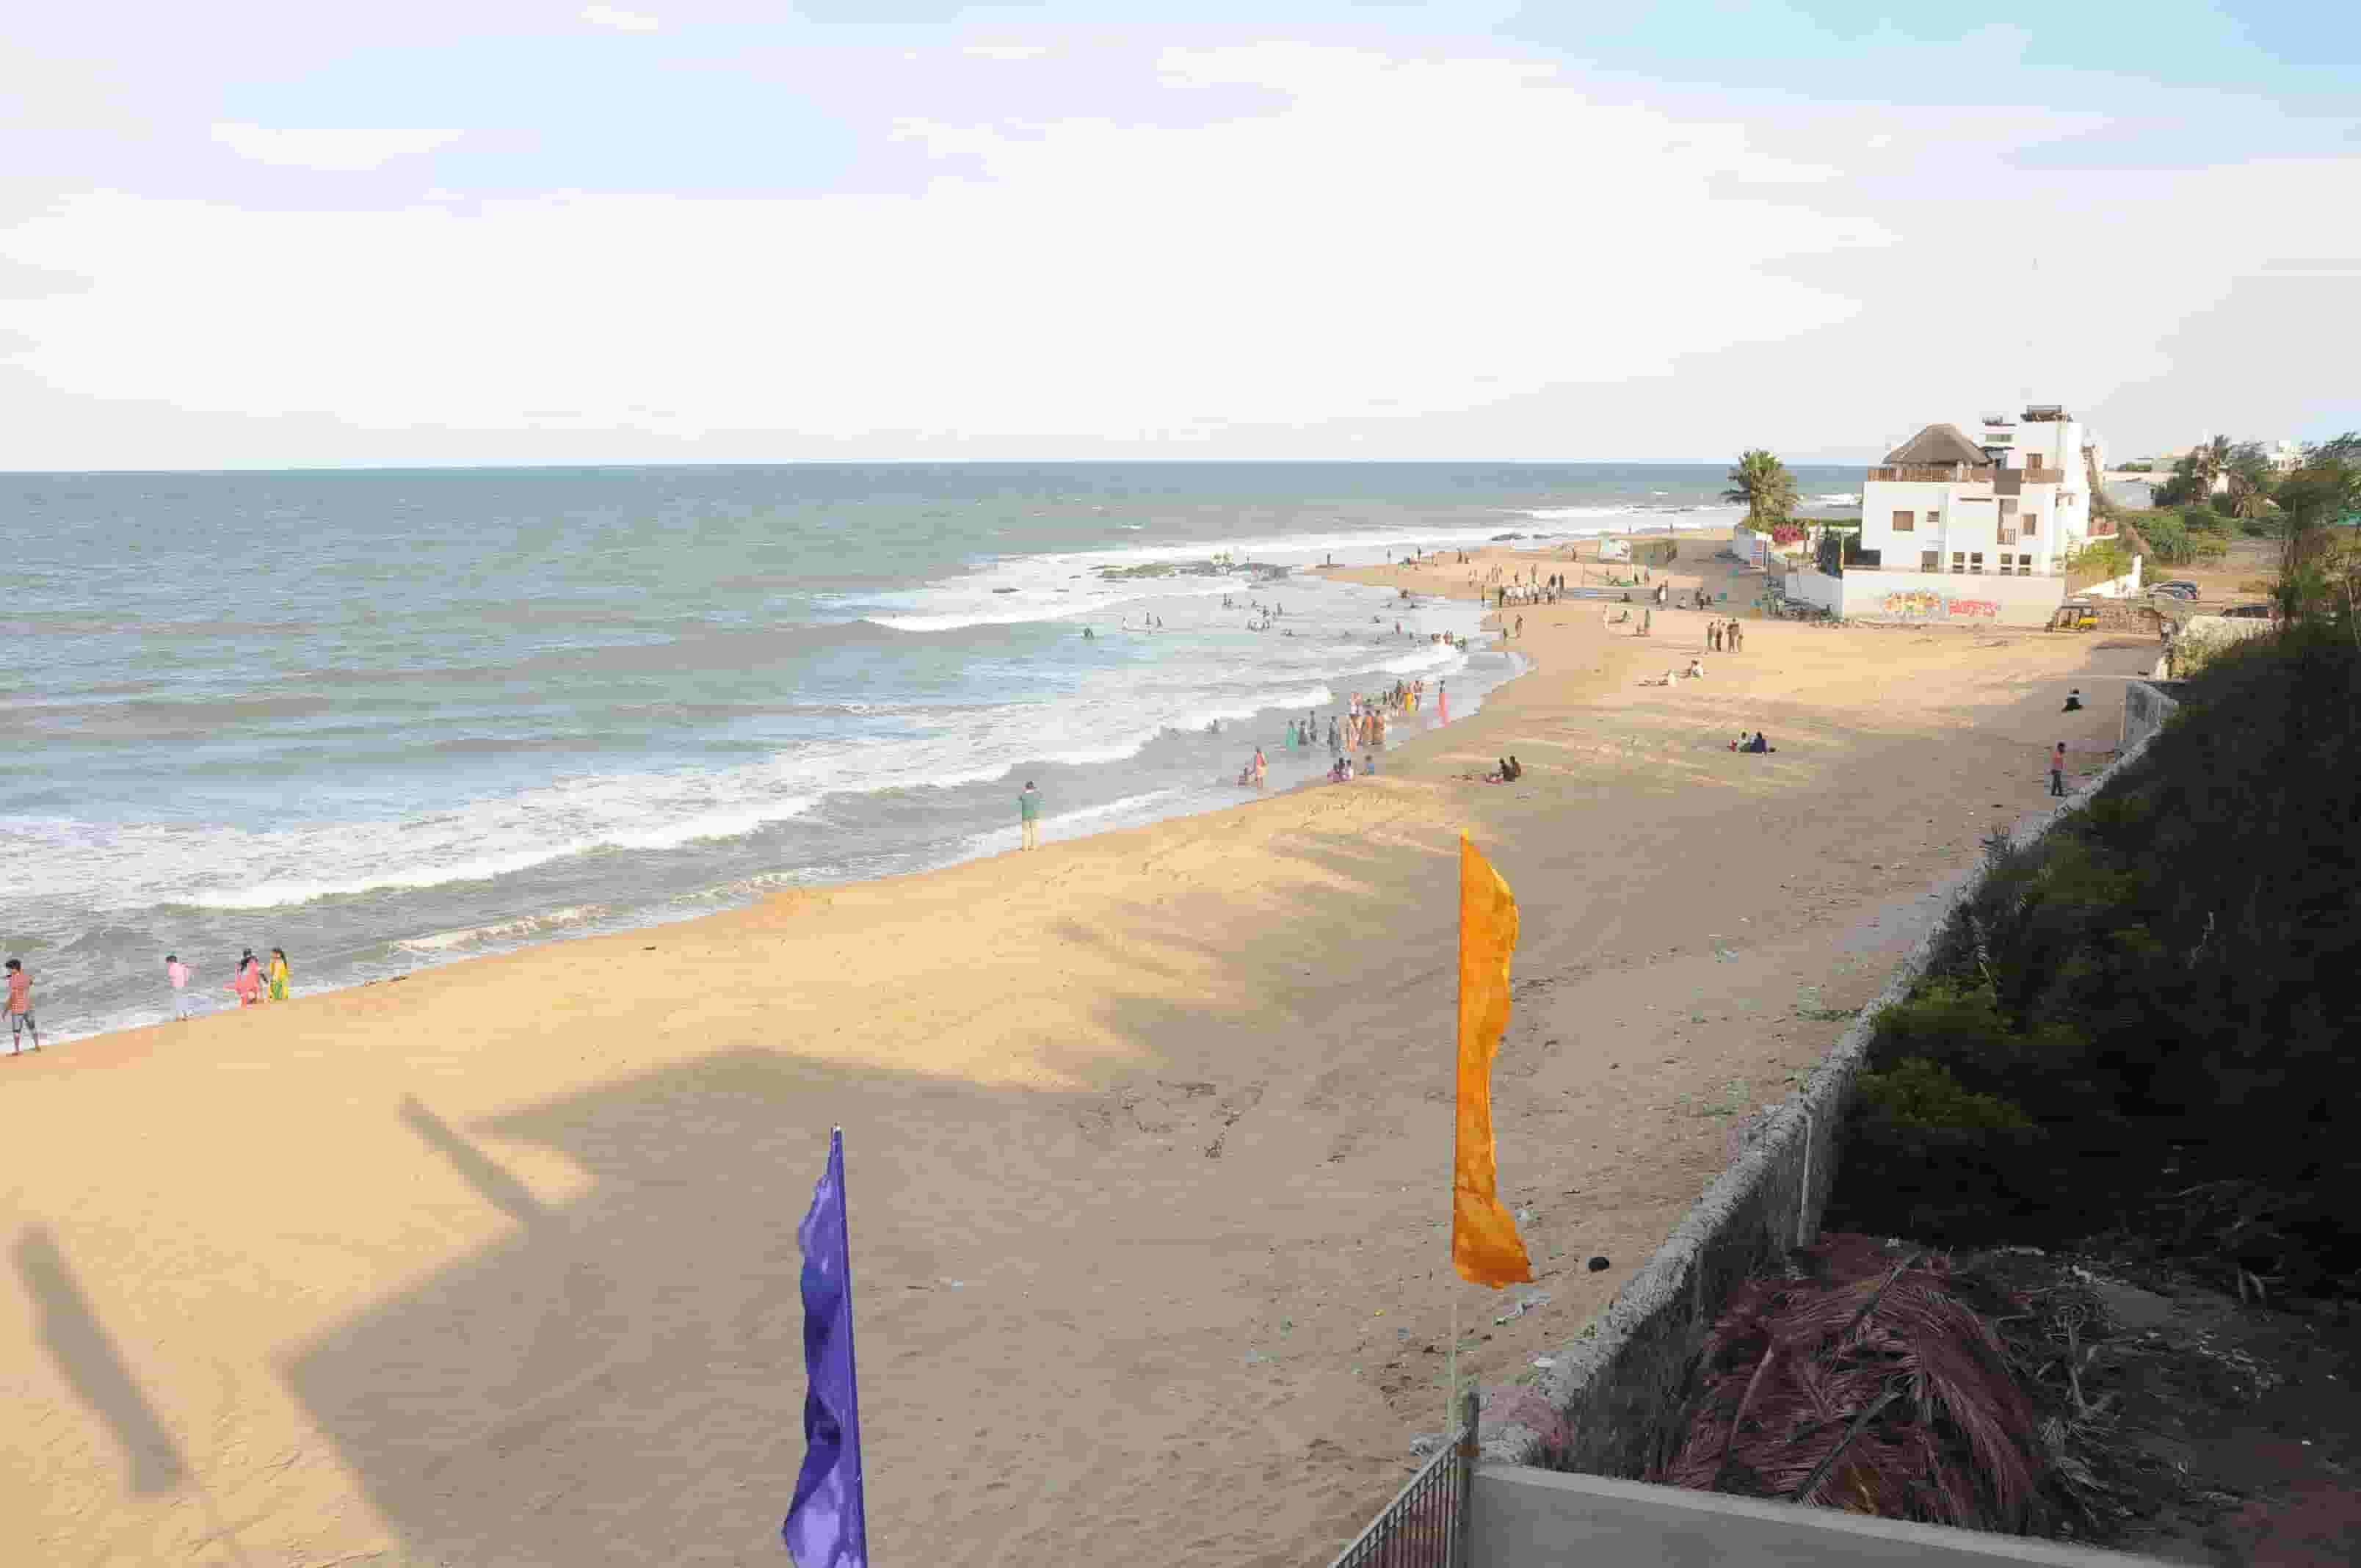 Sea La Vie Serviced Beach Villas Amp Studio Apartments